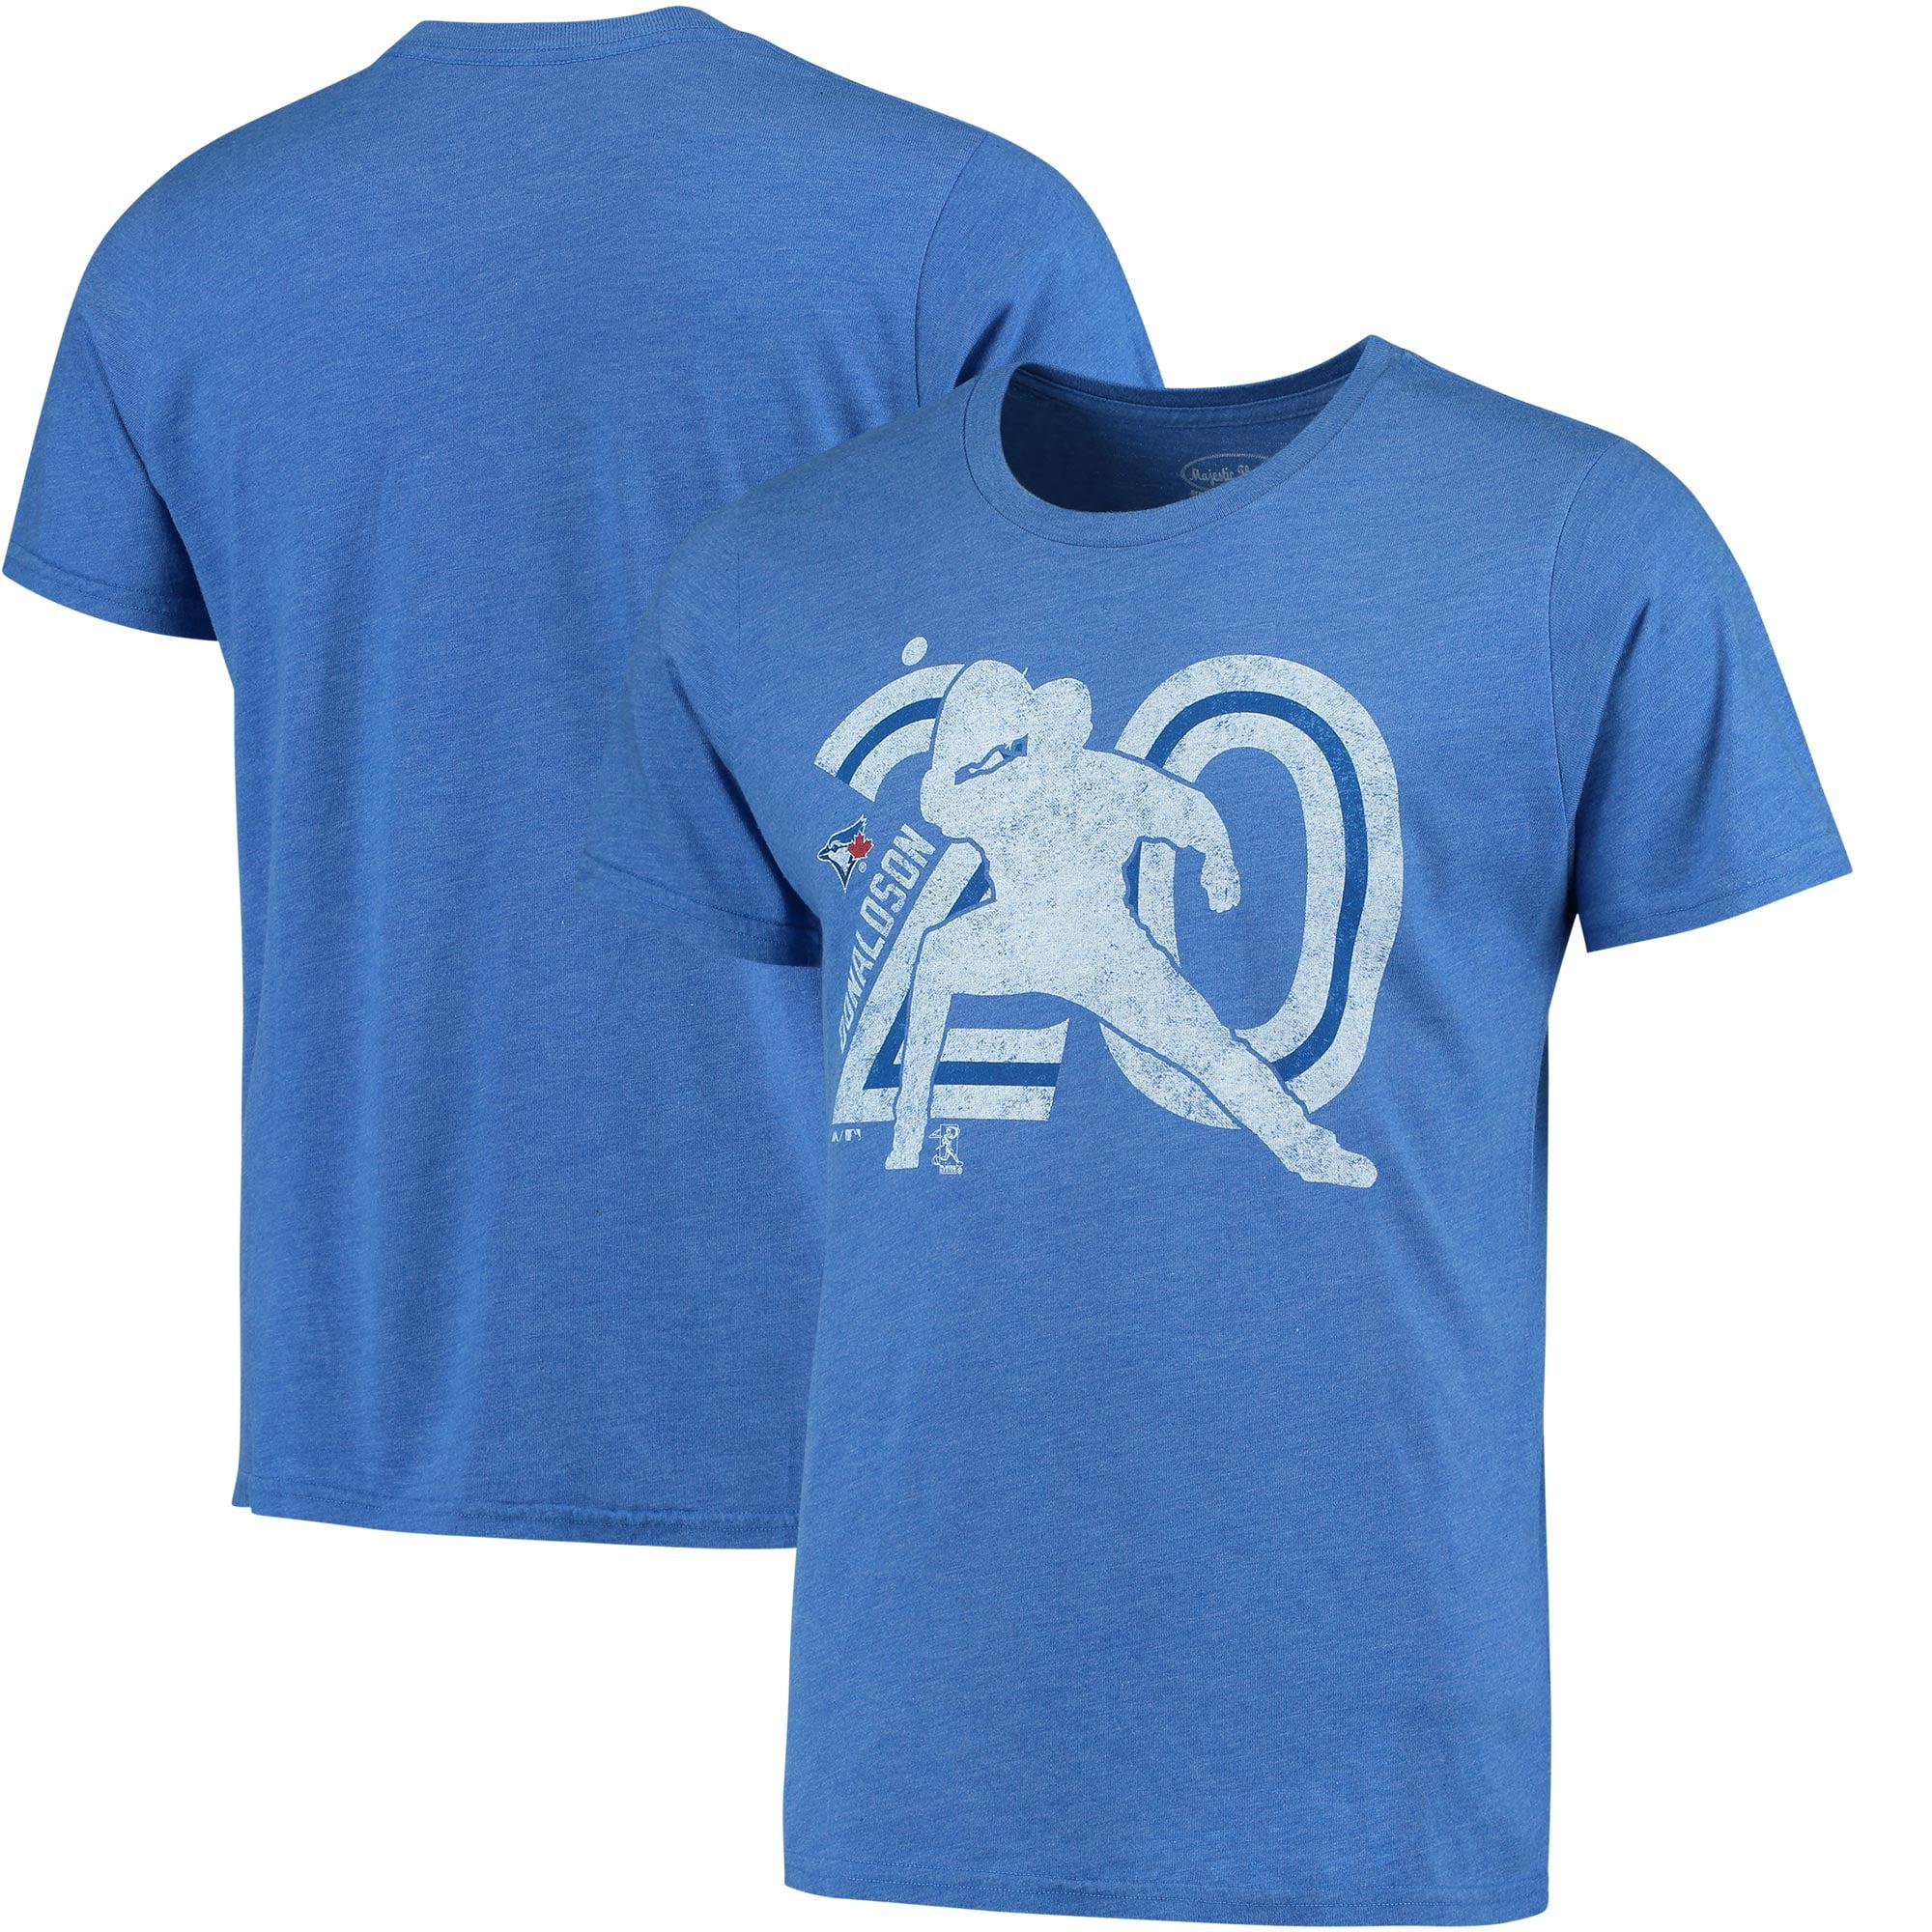 Josh Donaldson Toronto Blue Jays Majestic Threads Player Silhouette Tri-Blend T-Shirt - Royal